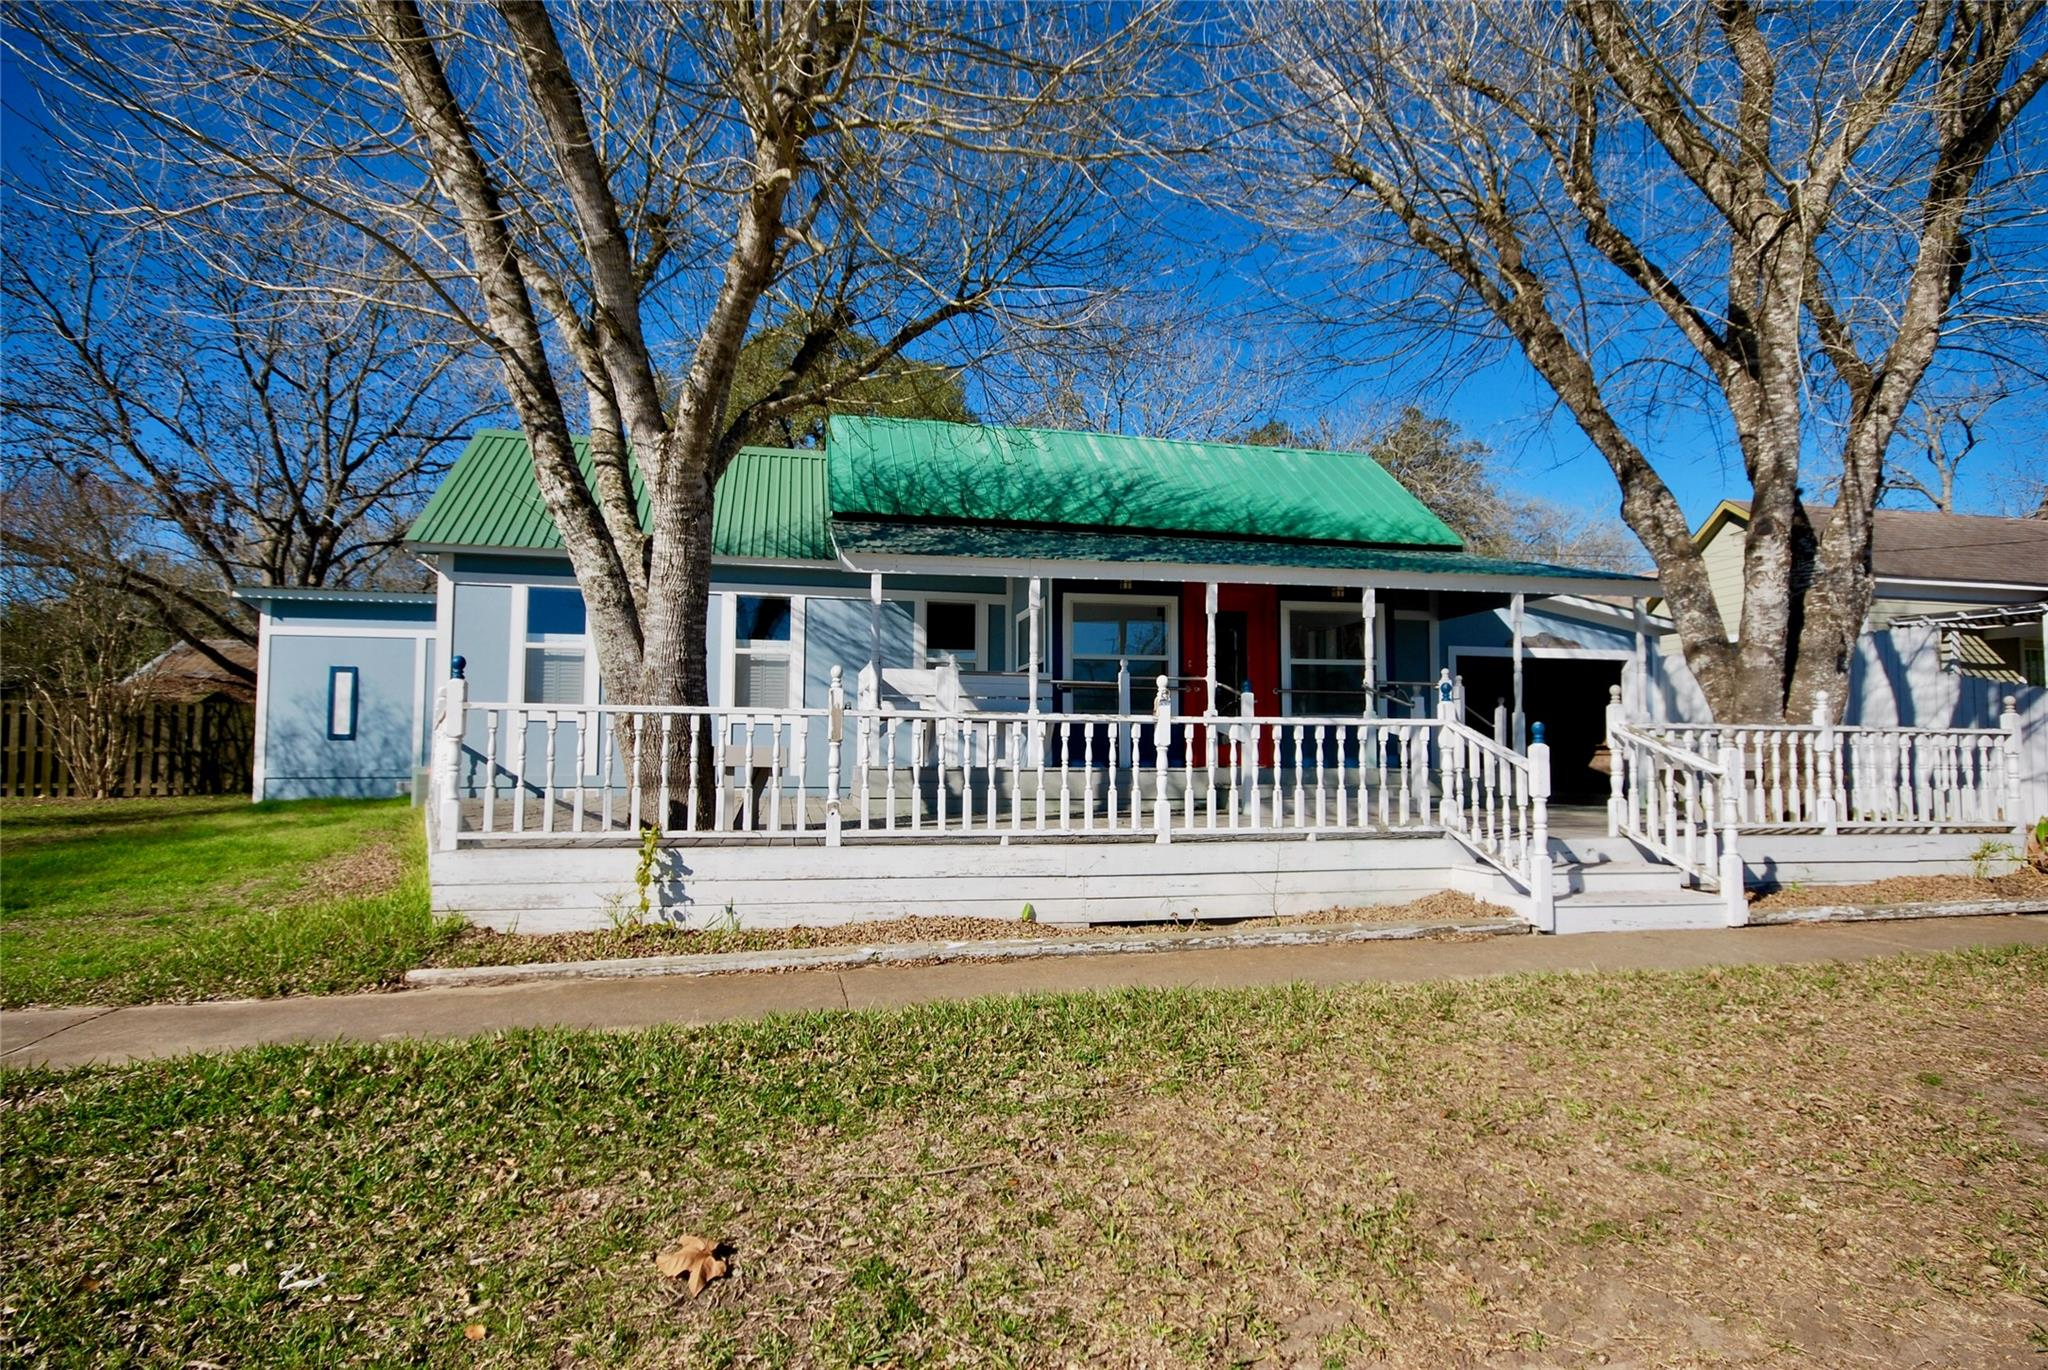 303 N Main Property Photo - Moulton, TX real estate listing